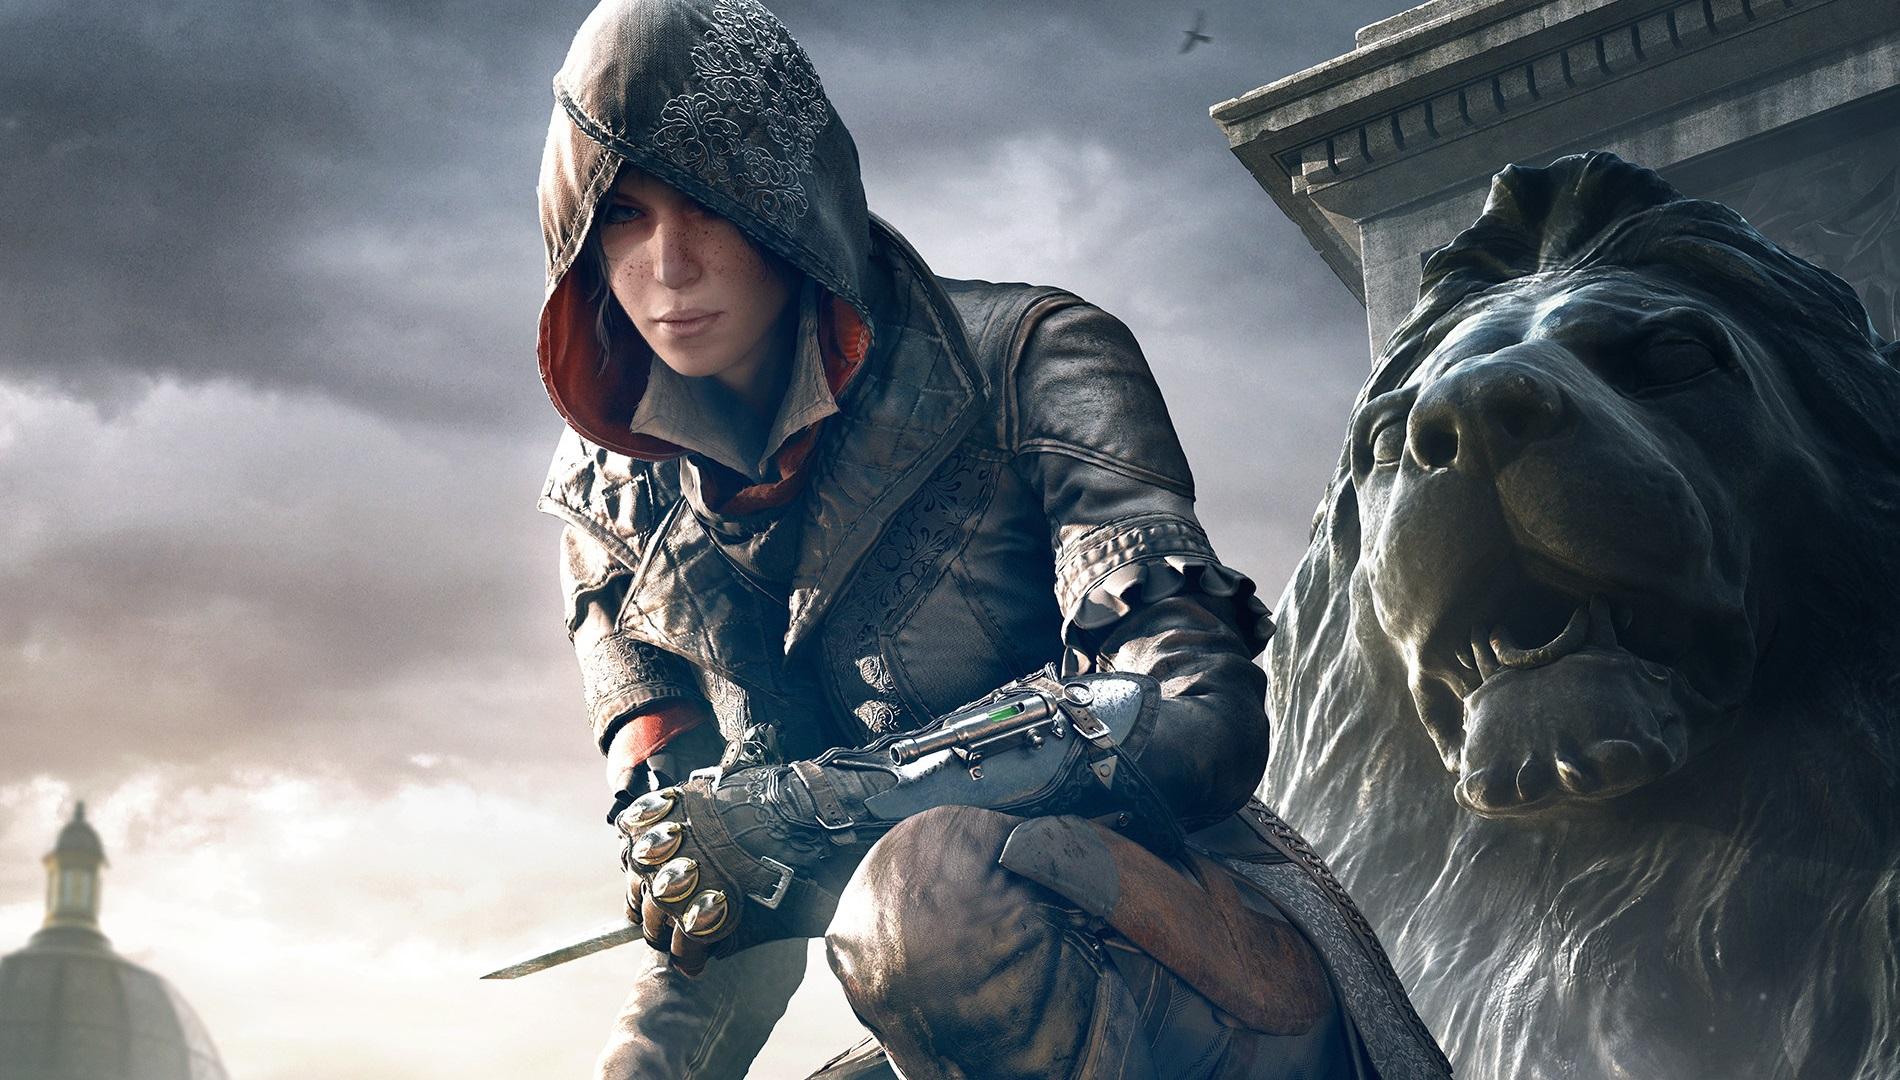 Wallpaper 1900x1080 Px Assassins Creed Assassins Creed